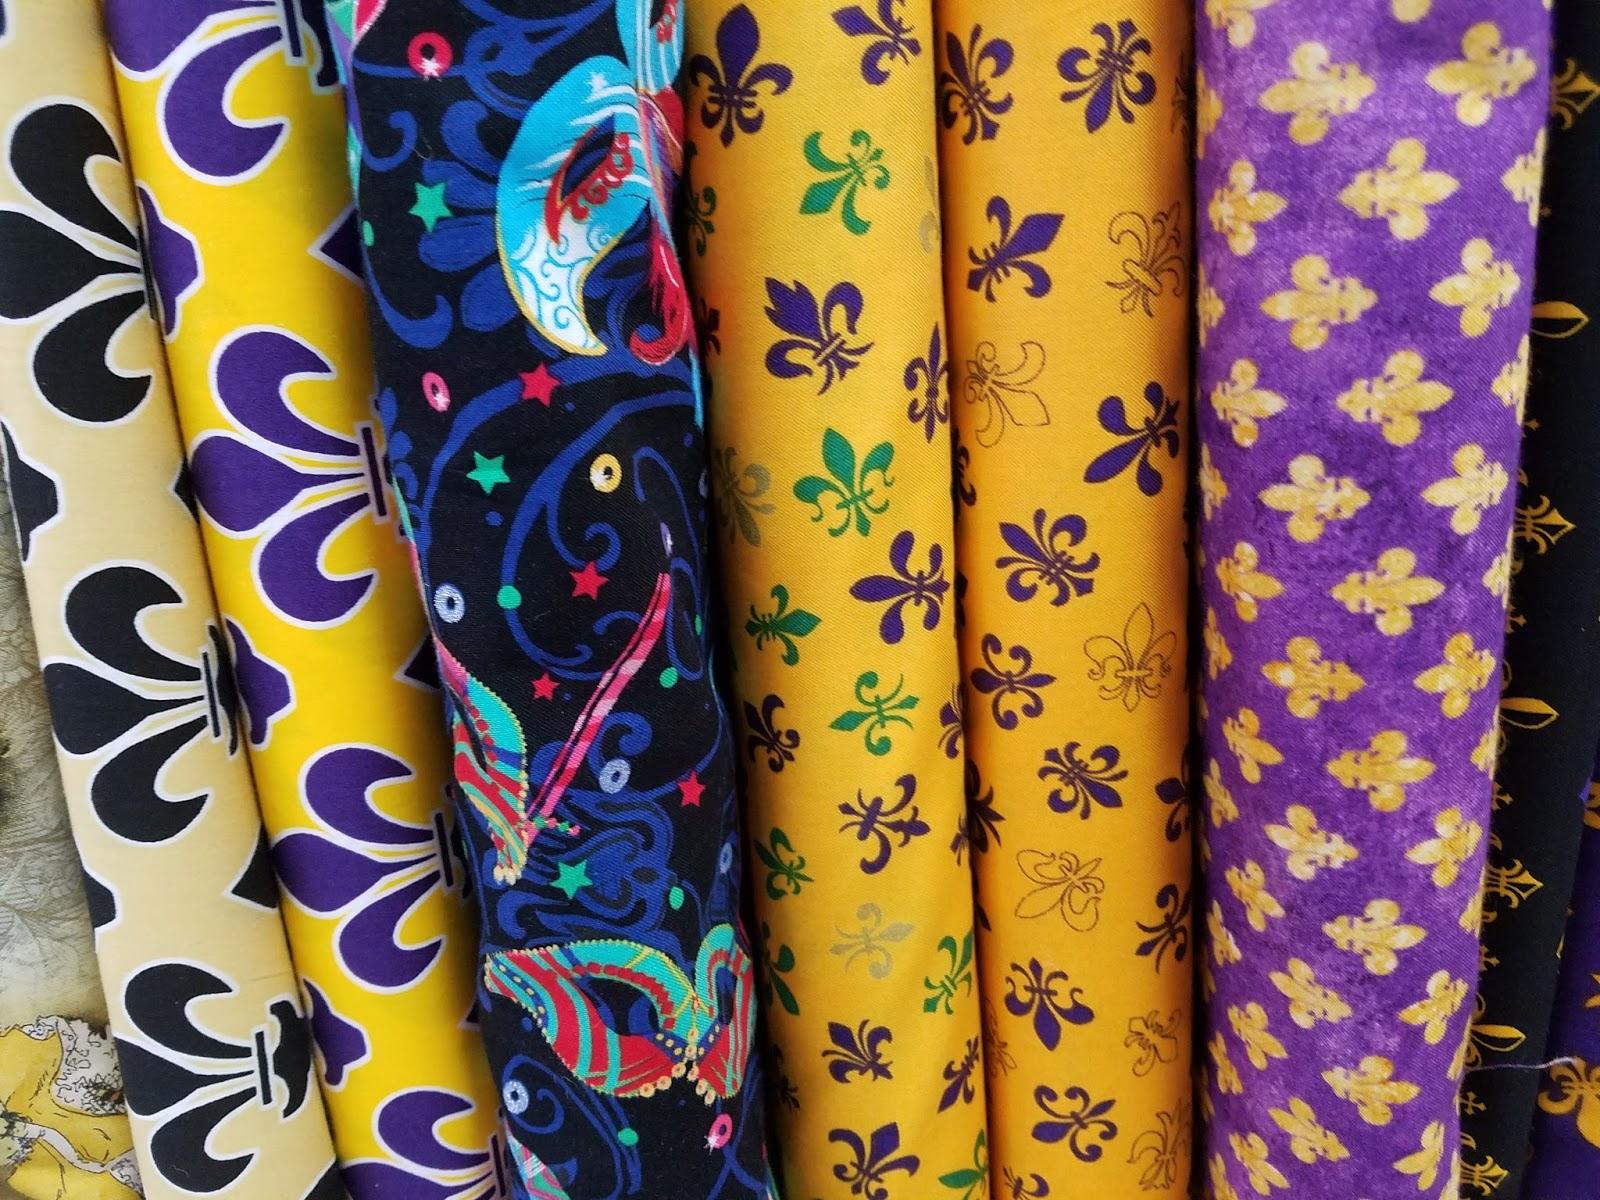 High fashion fabric houston - Miles Of Mardi Gras Fabric At High Fashion Fabrics In Midtown